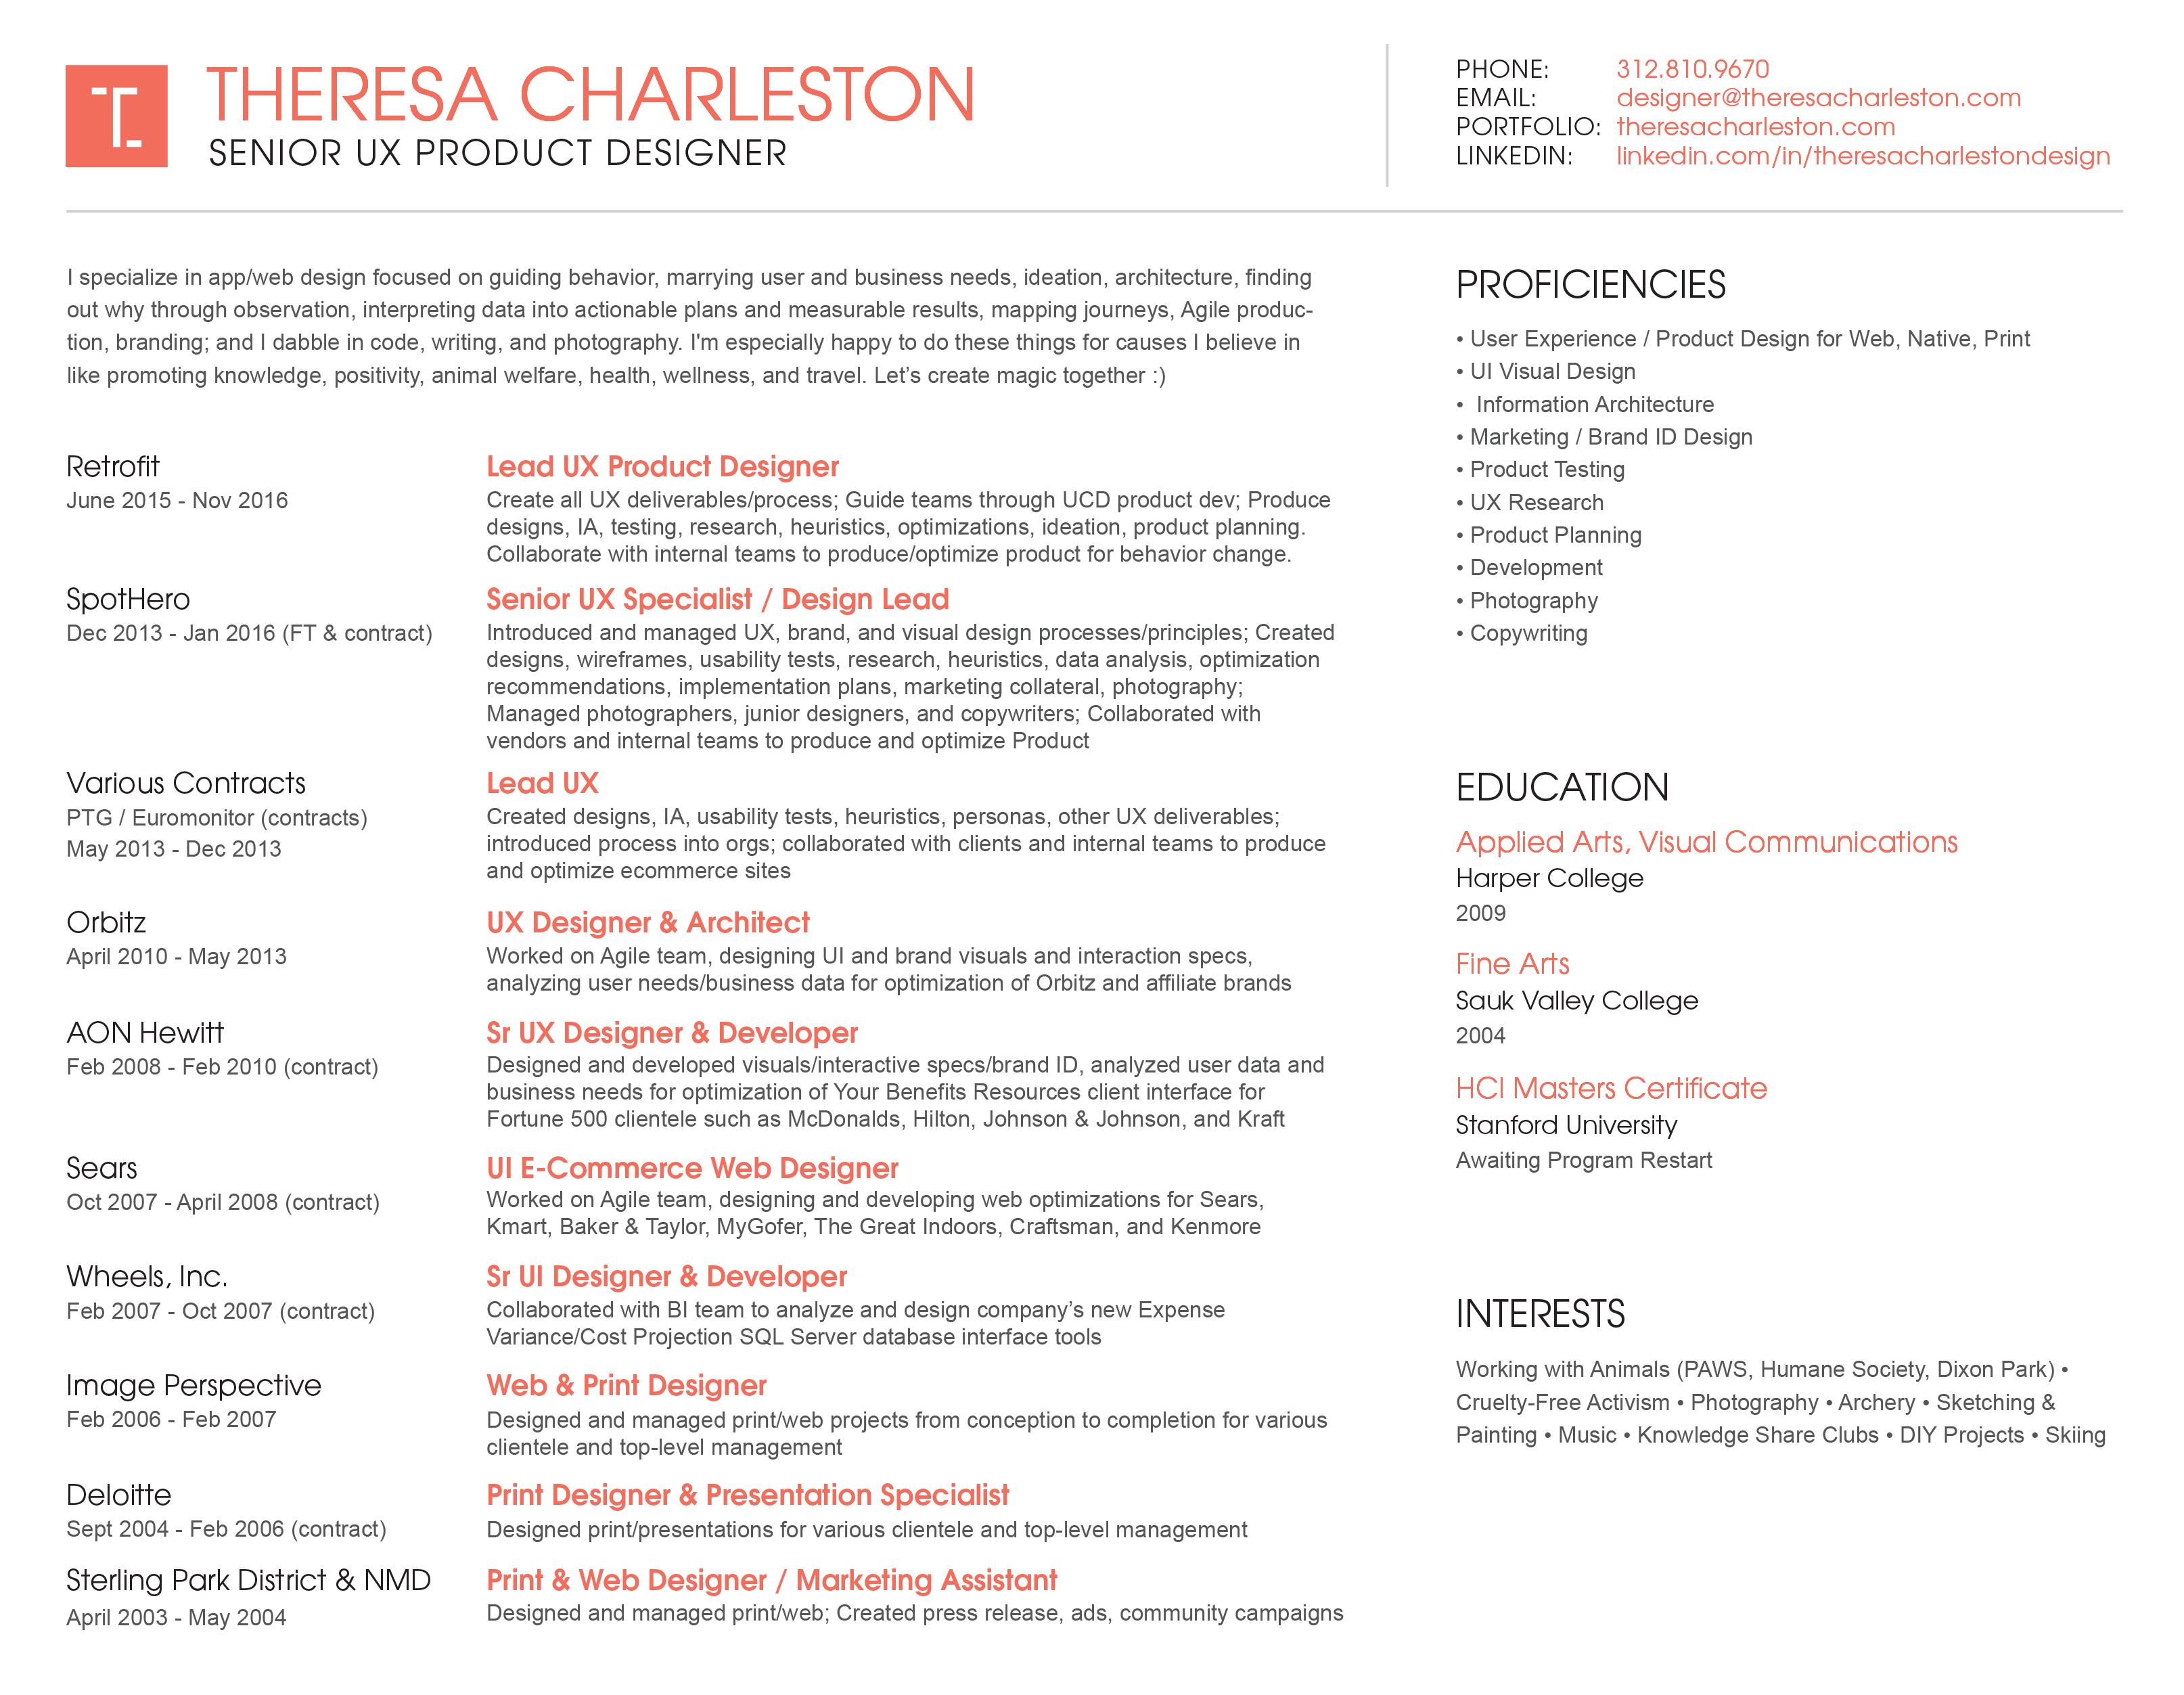 T Charleston Resume